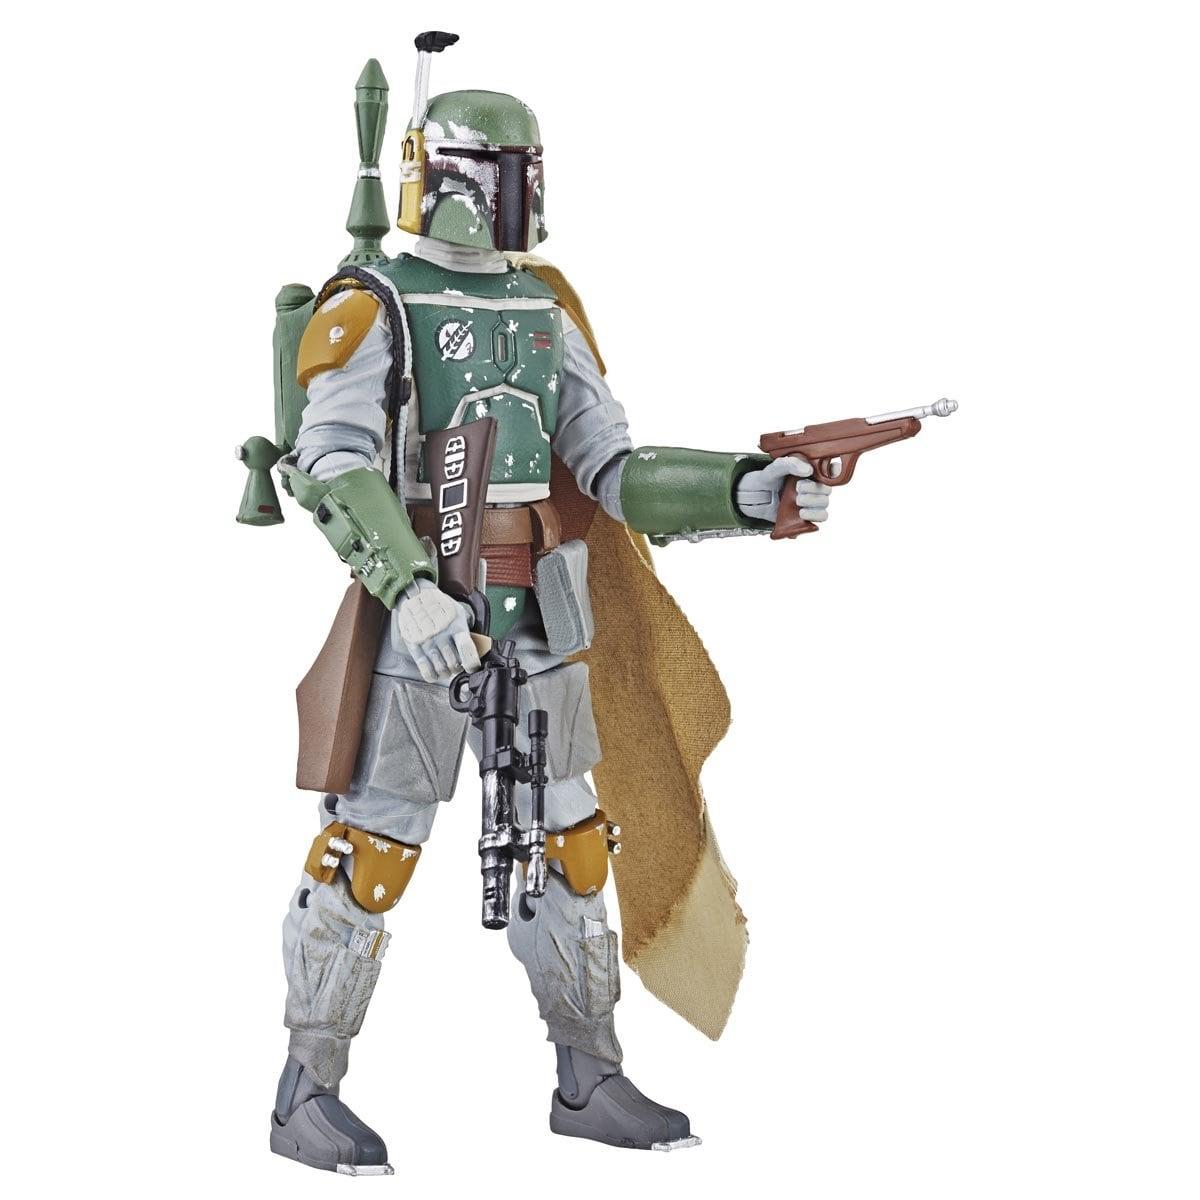 "Star Wars Figura Boba Fett 6"" Hasbro"